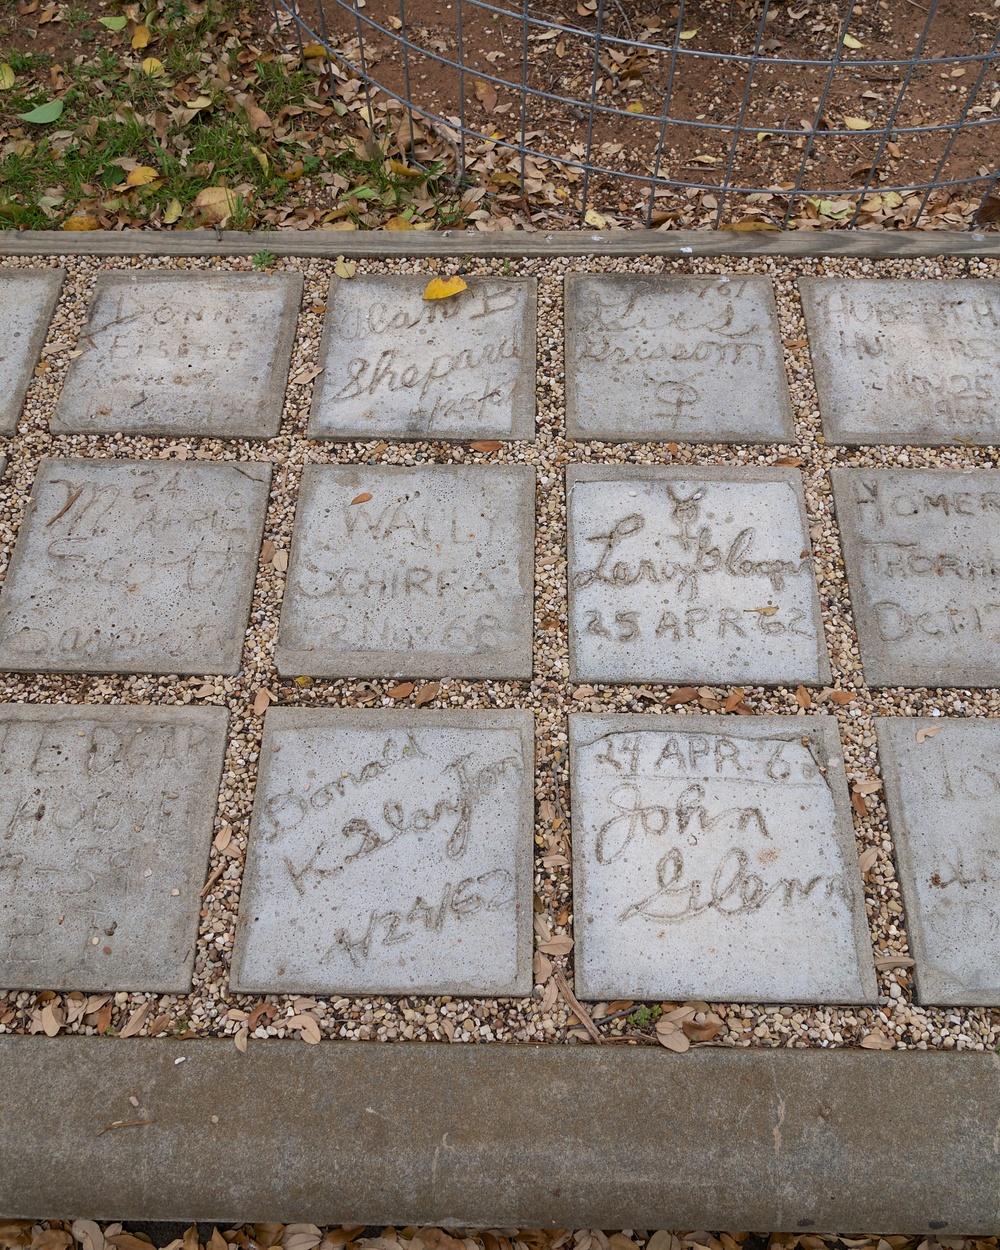 Friendship stones of several astronauts